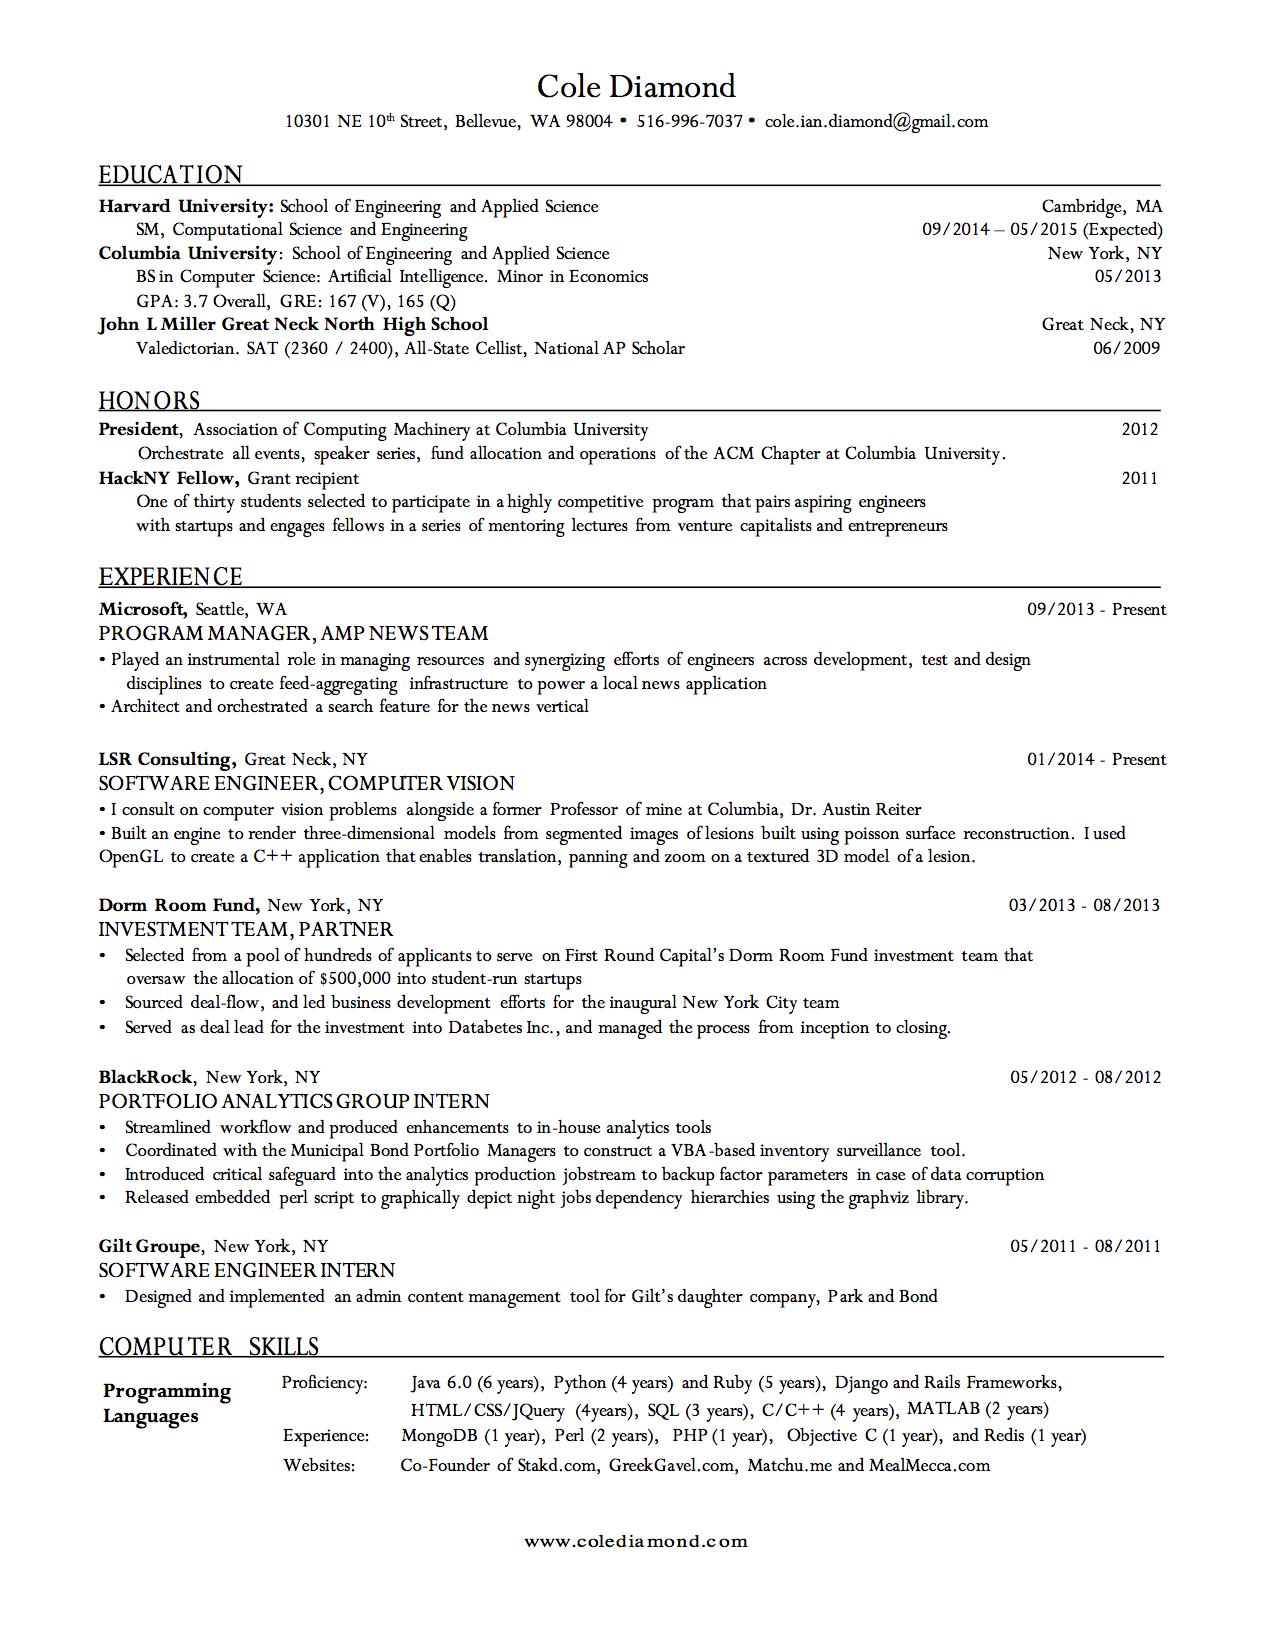 harvard style resume expert preferred resume templates resume